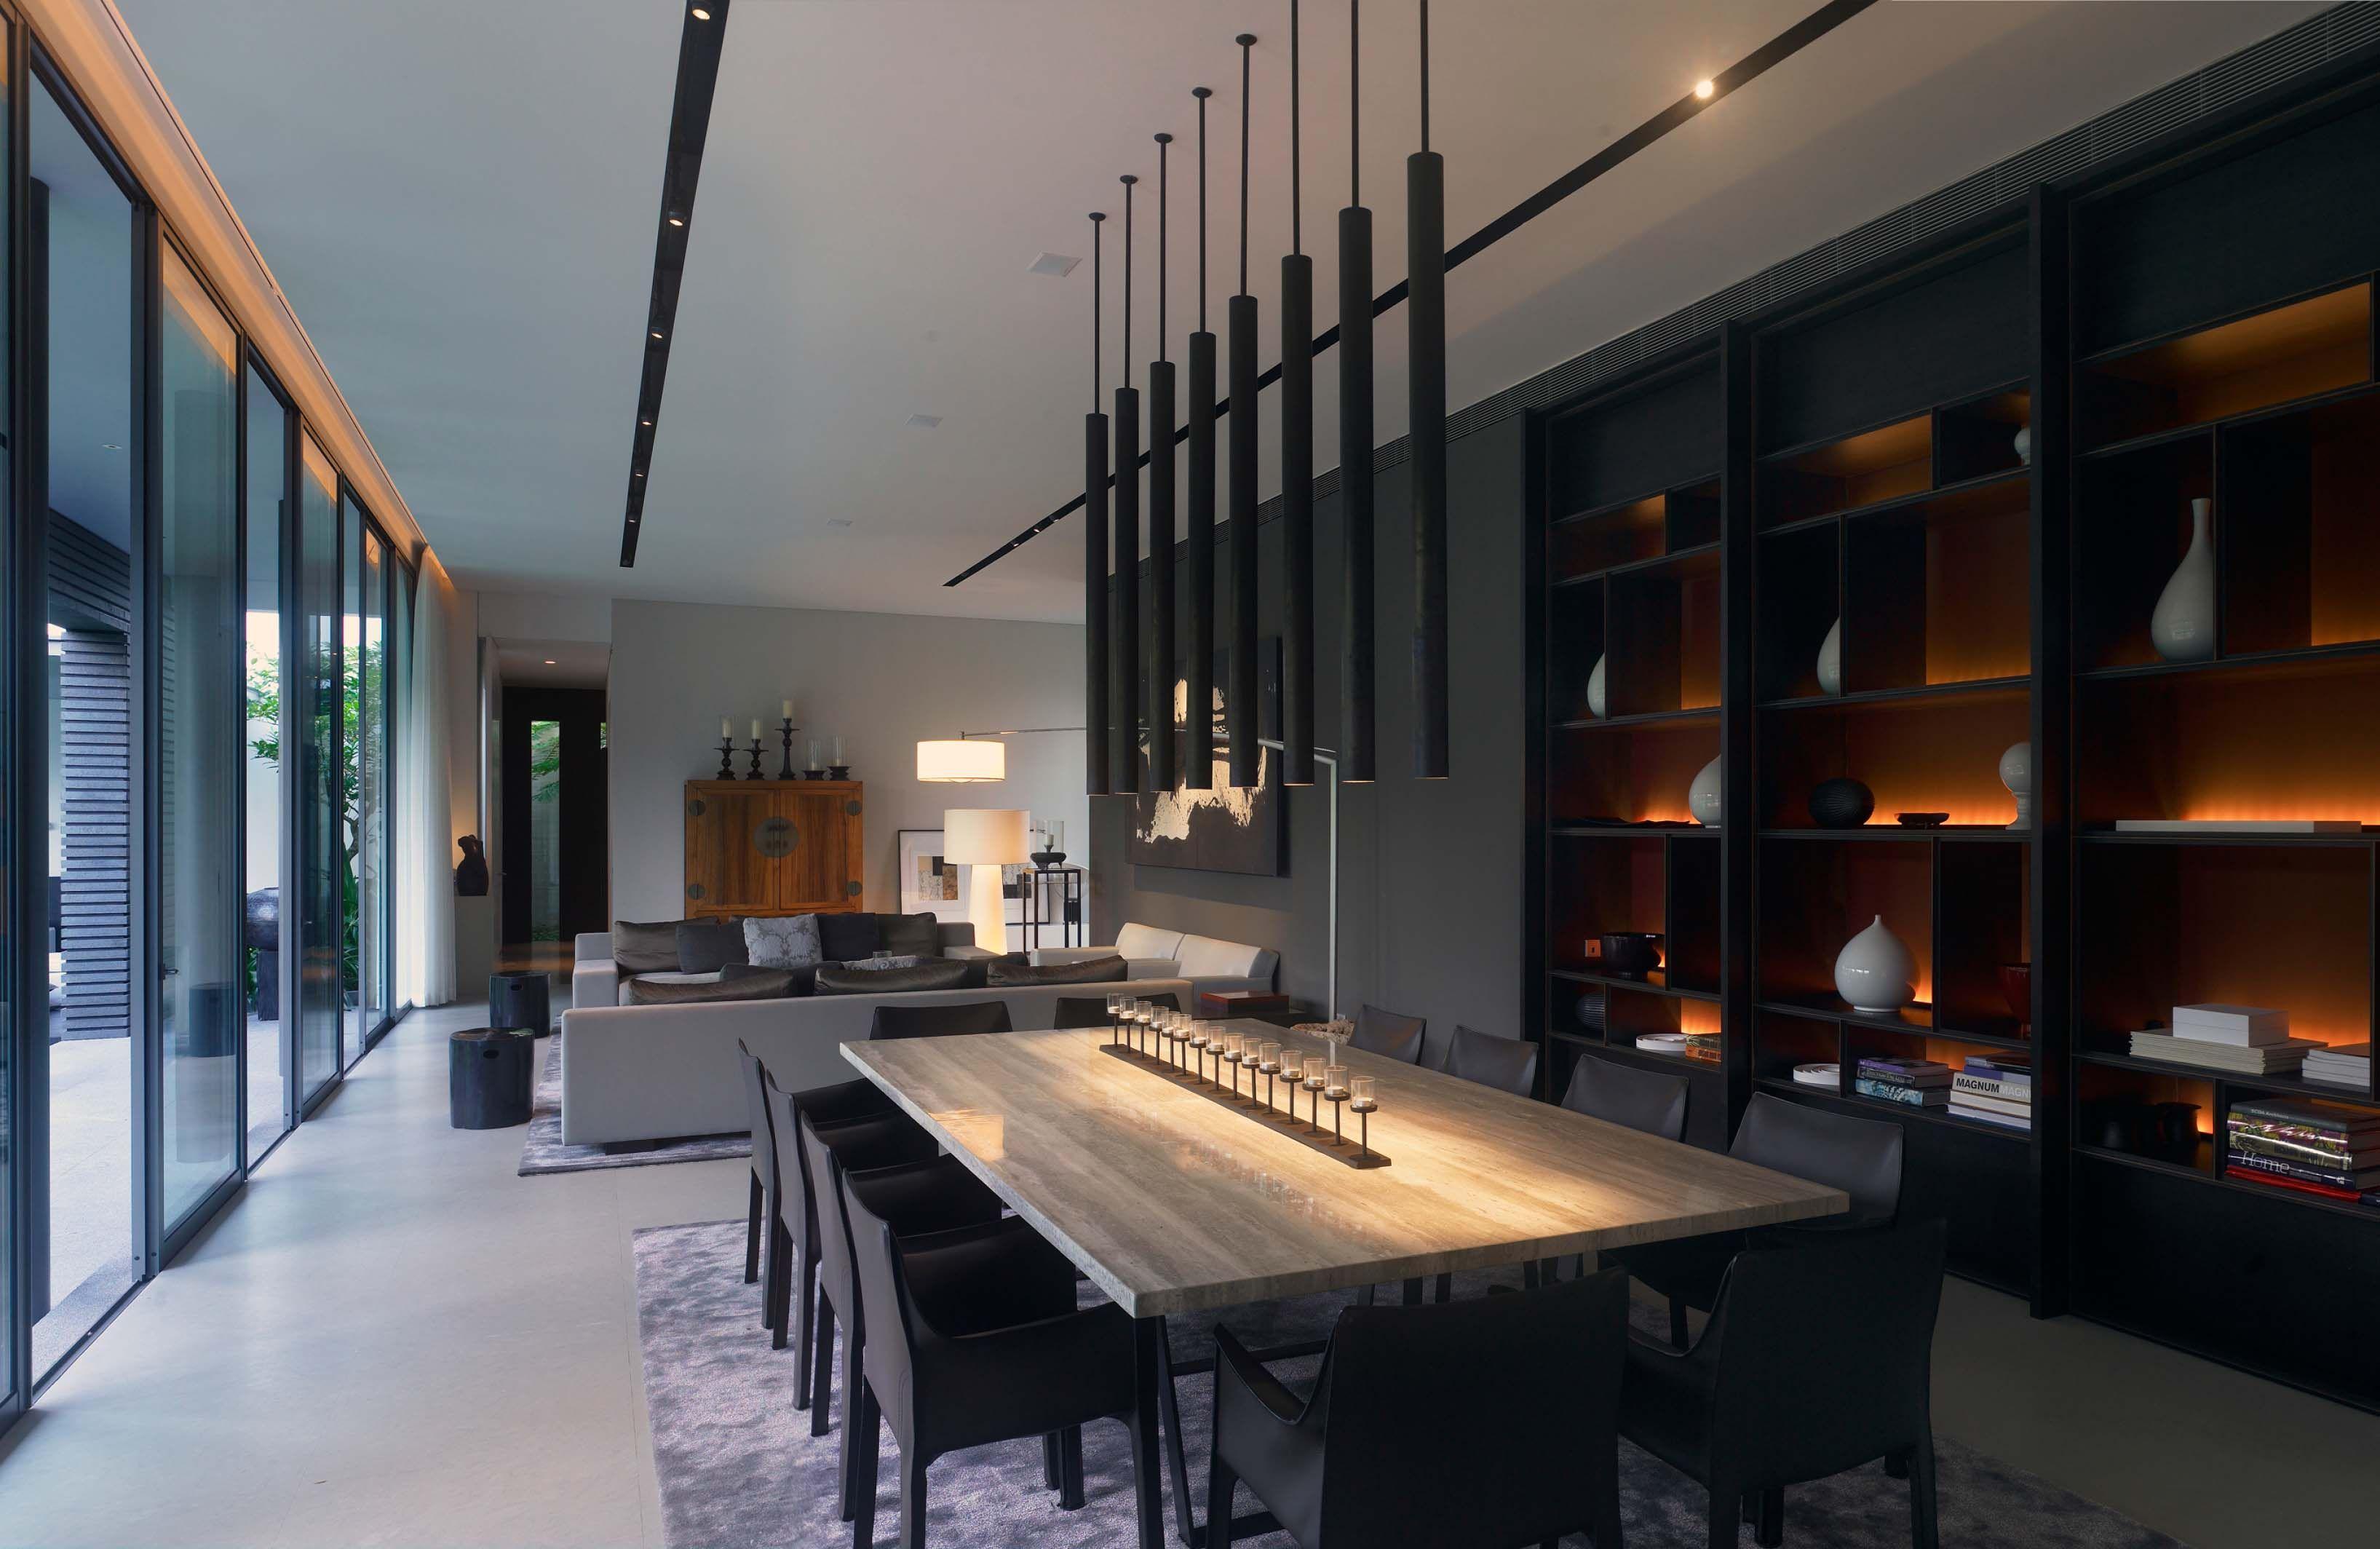 scda holland road residence singapore interior pinterest wohnideen beleuchtung und esszimmer. Black Bedroom Furniture Sets. Home Design Ideas